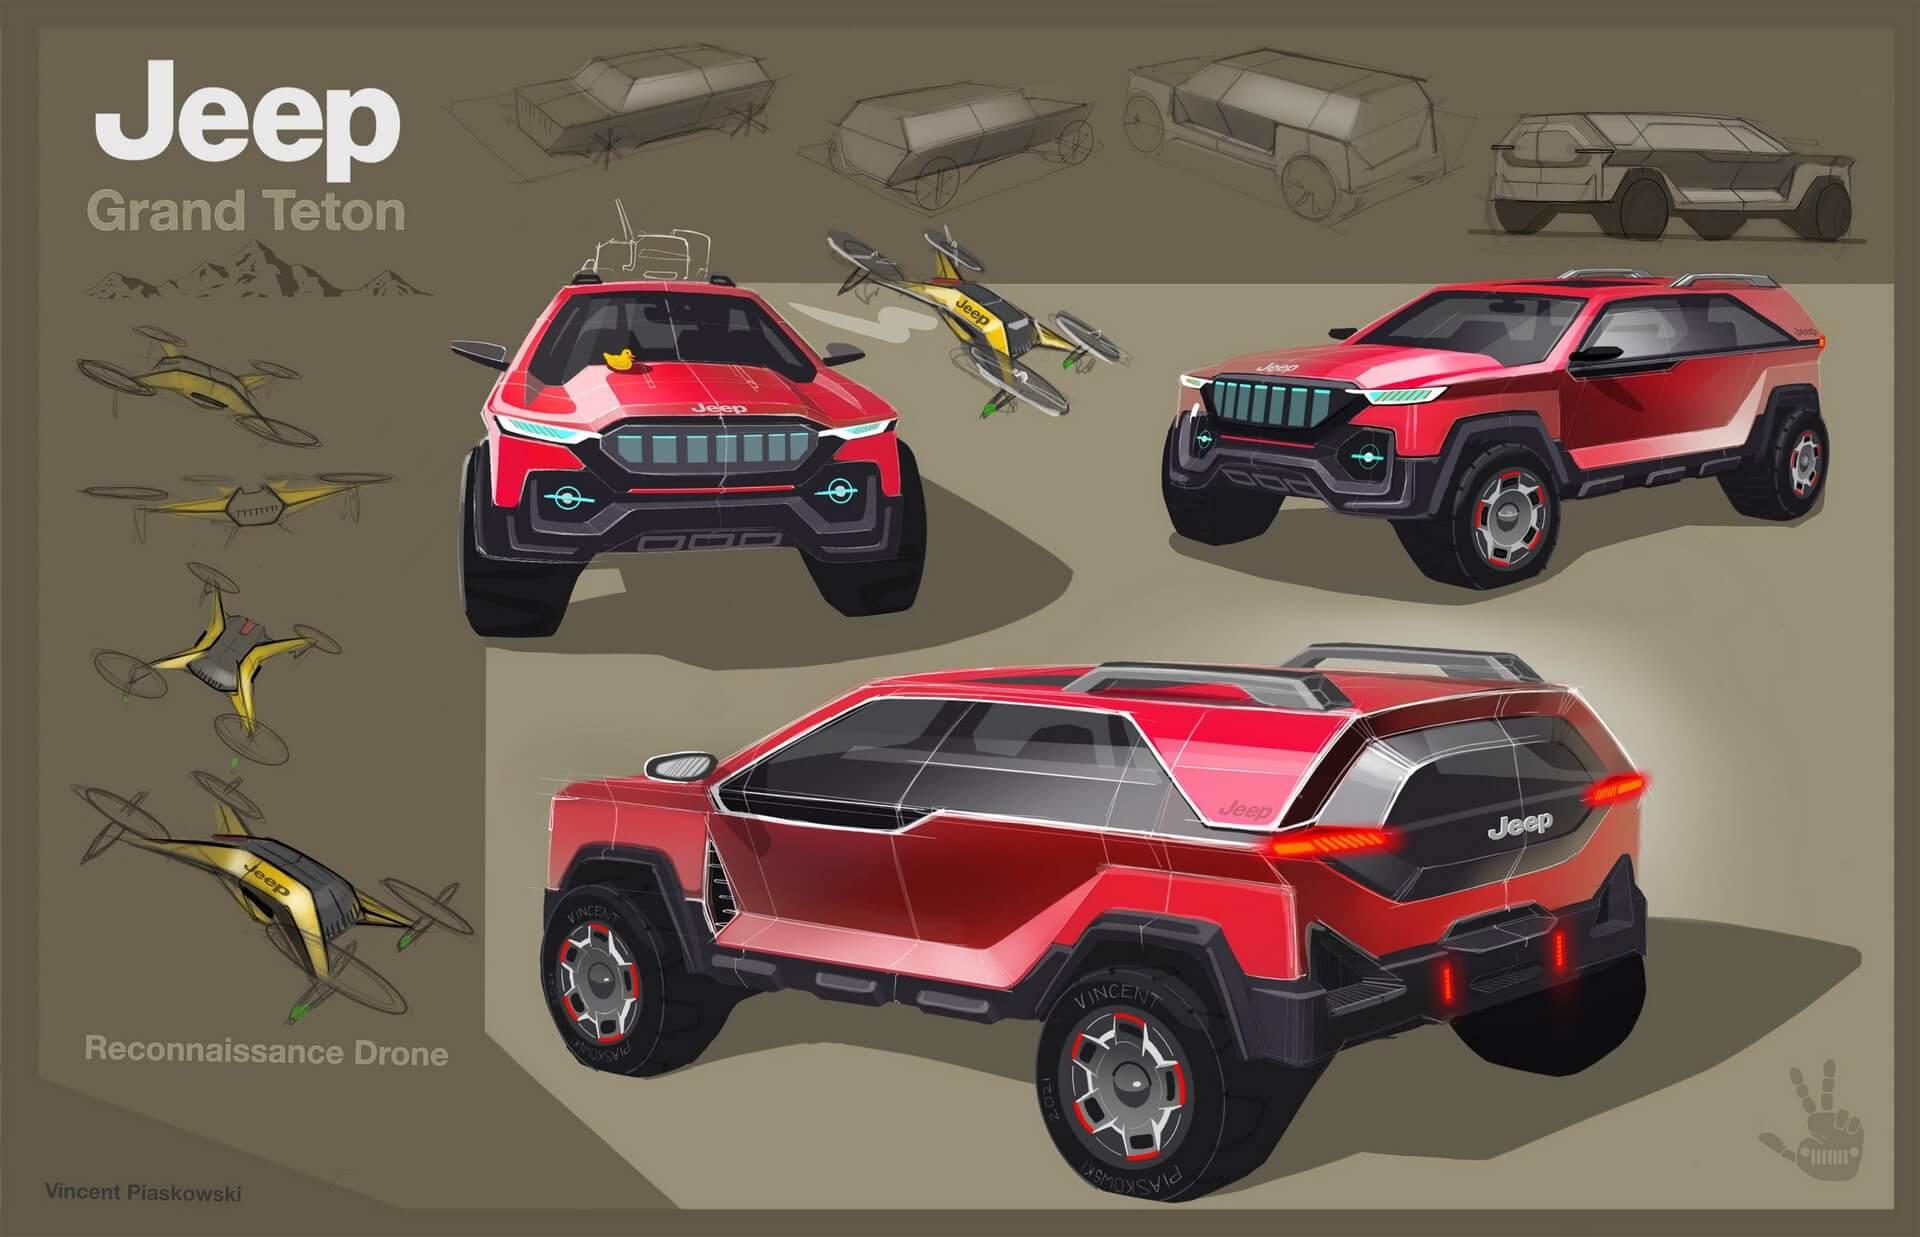 Jeep Grand Teton